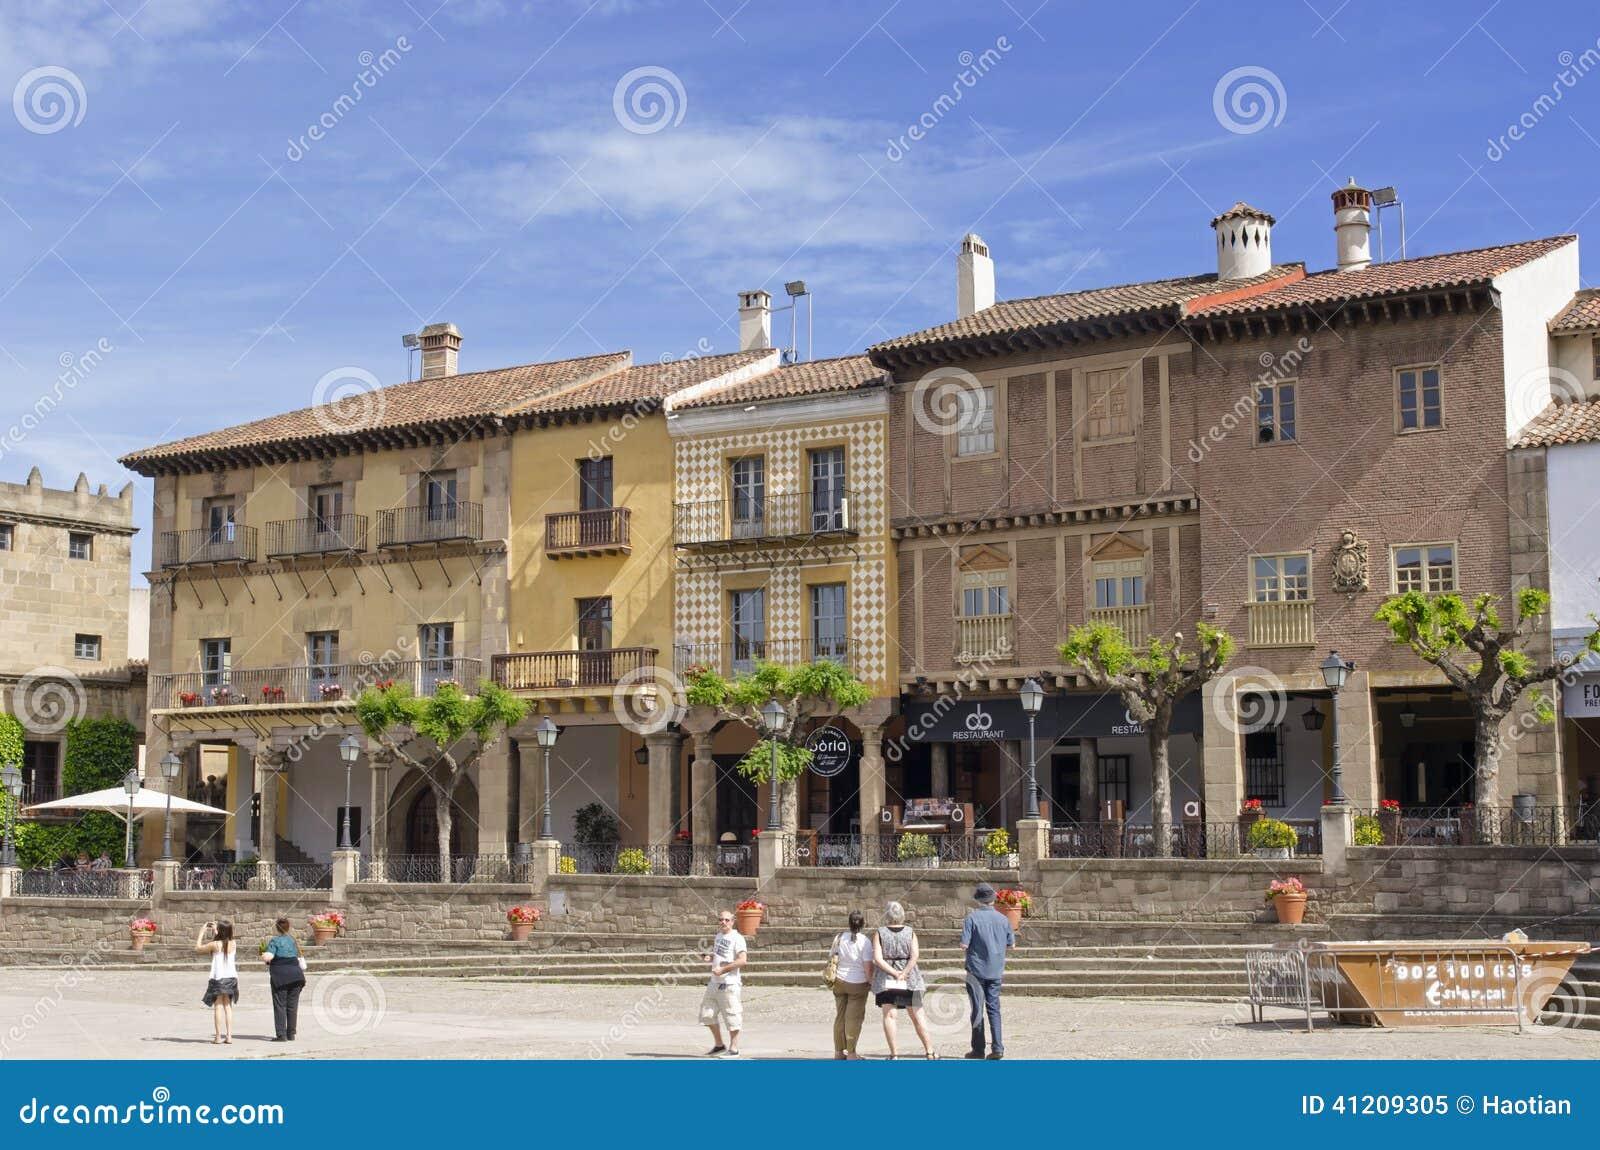 Poble Espanol In Barcelona